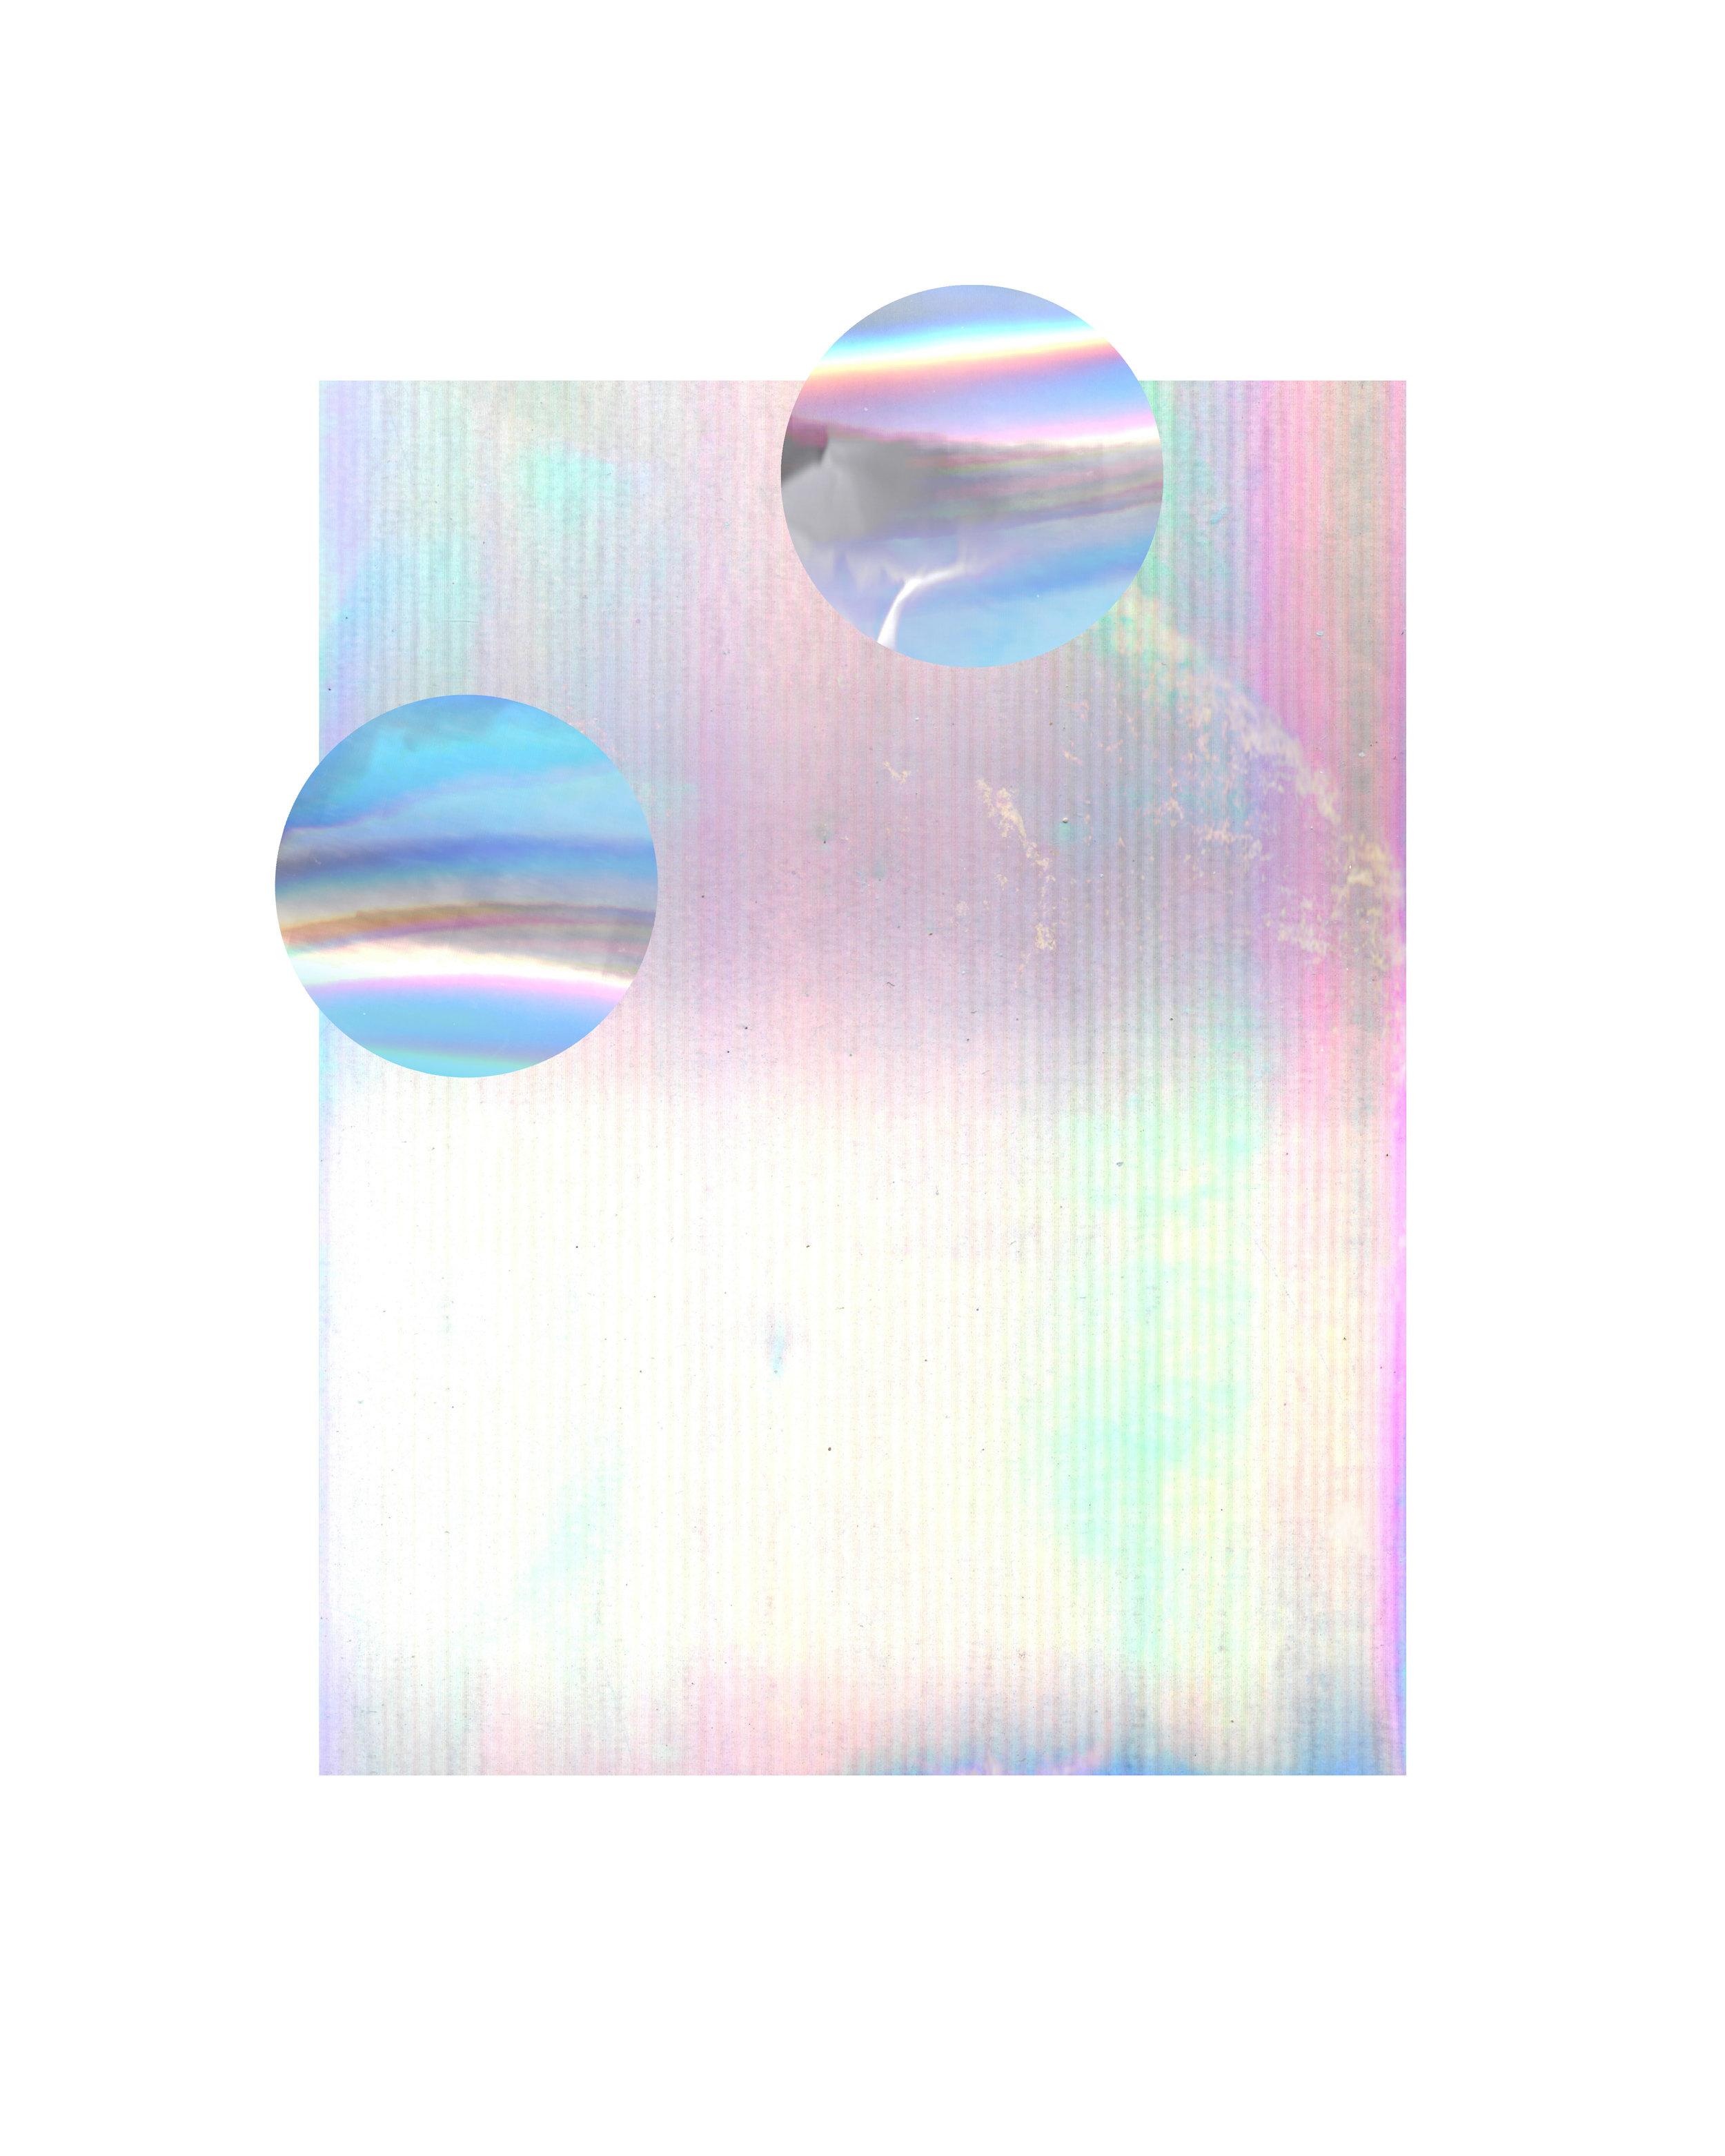 "glimmer 16""x20"" digital, 2019 iridescent foil, crumpled paper"